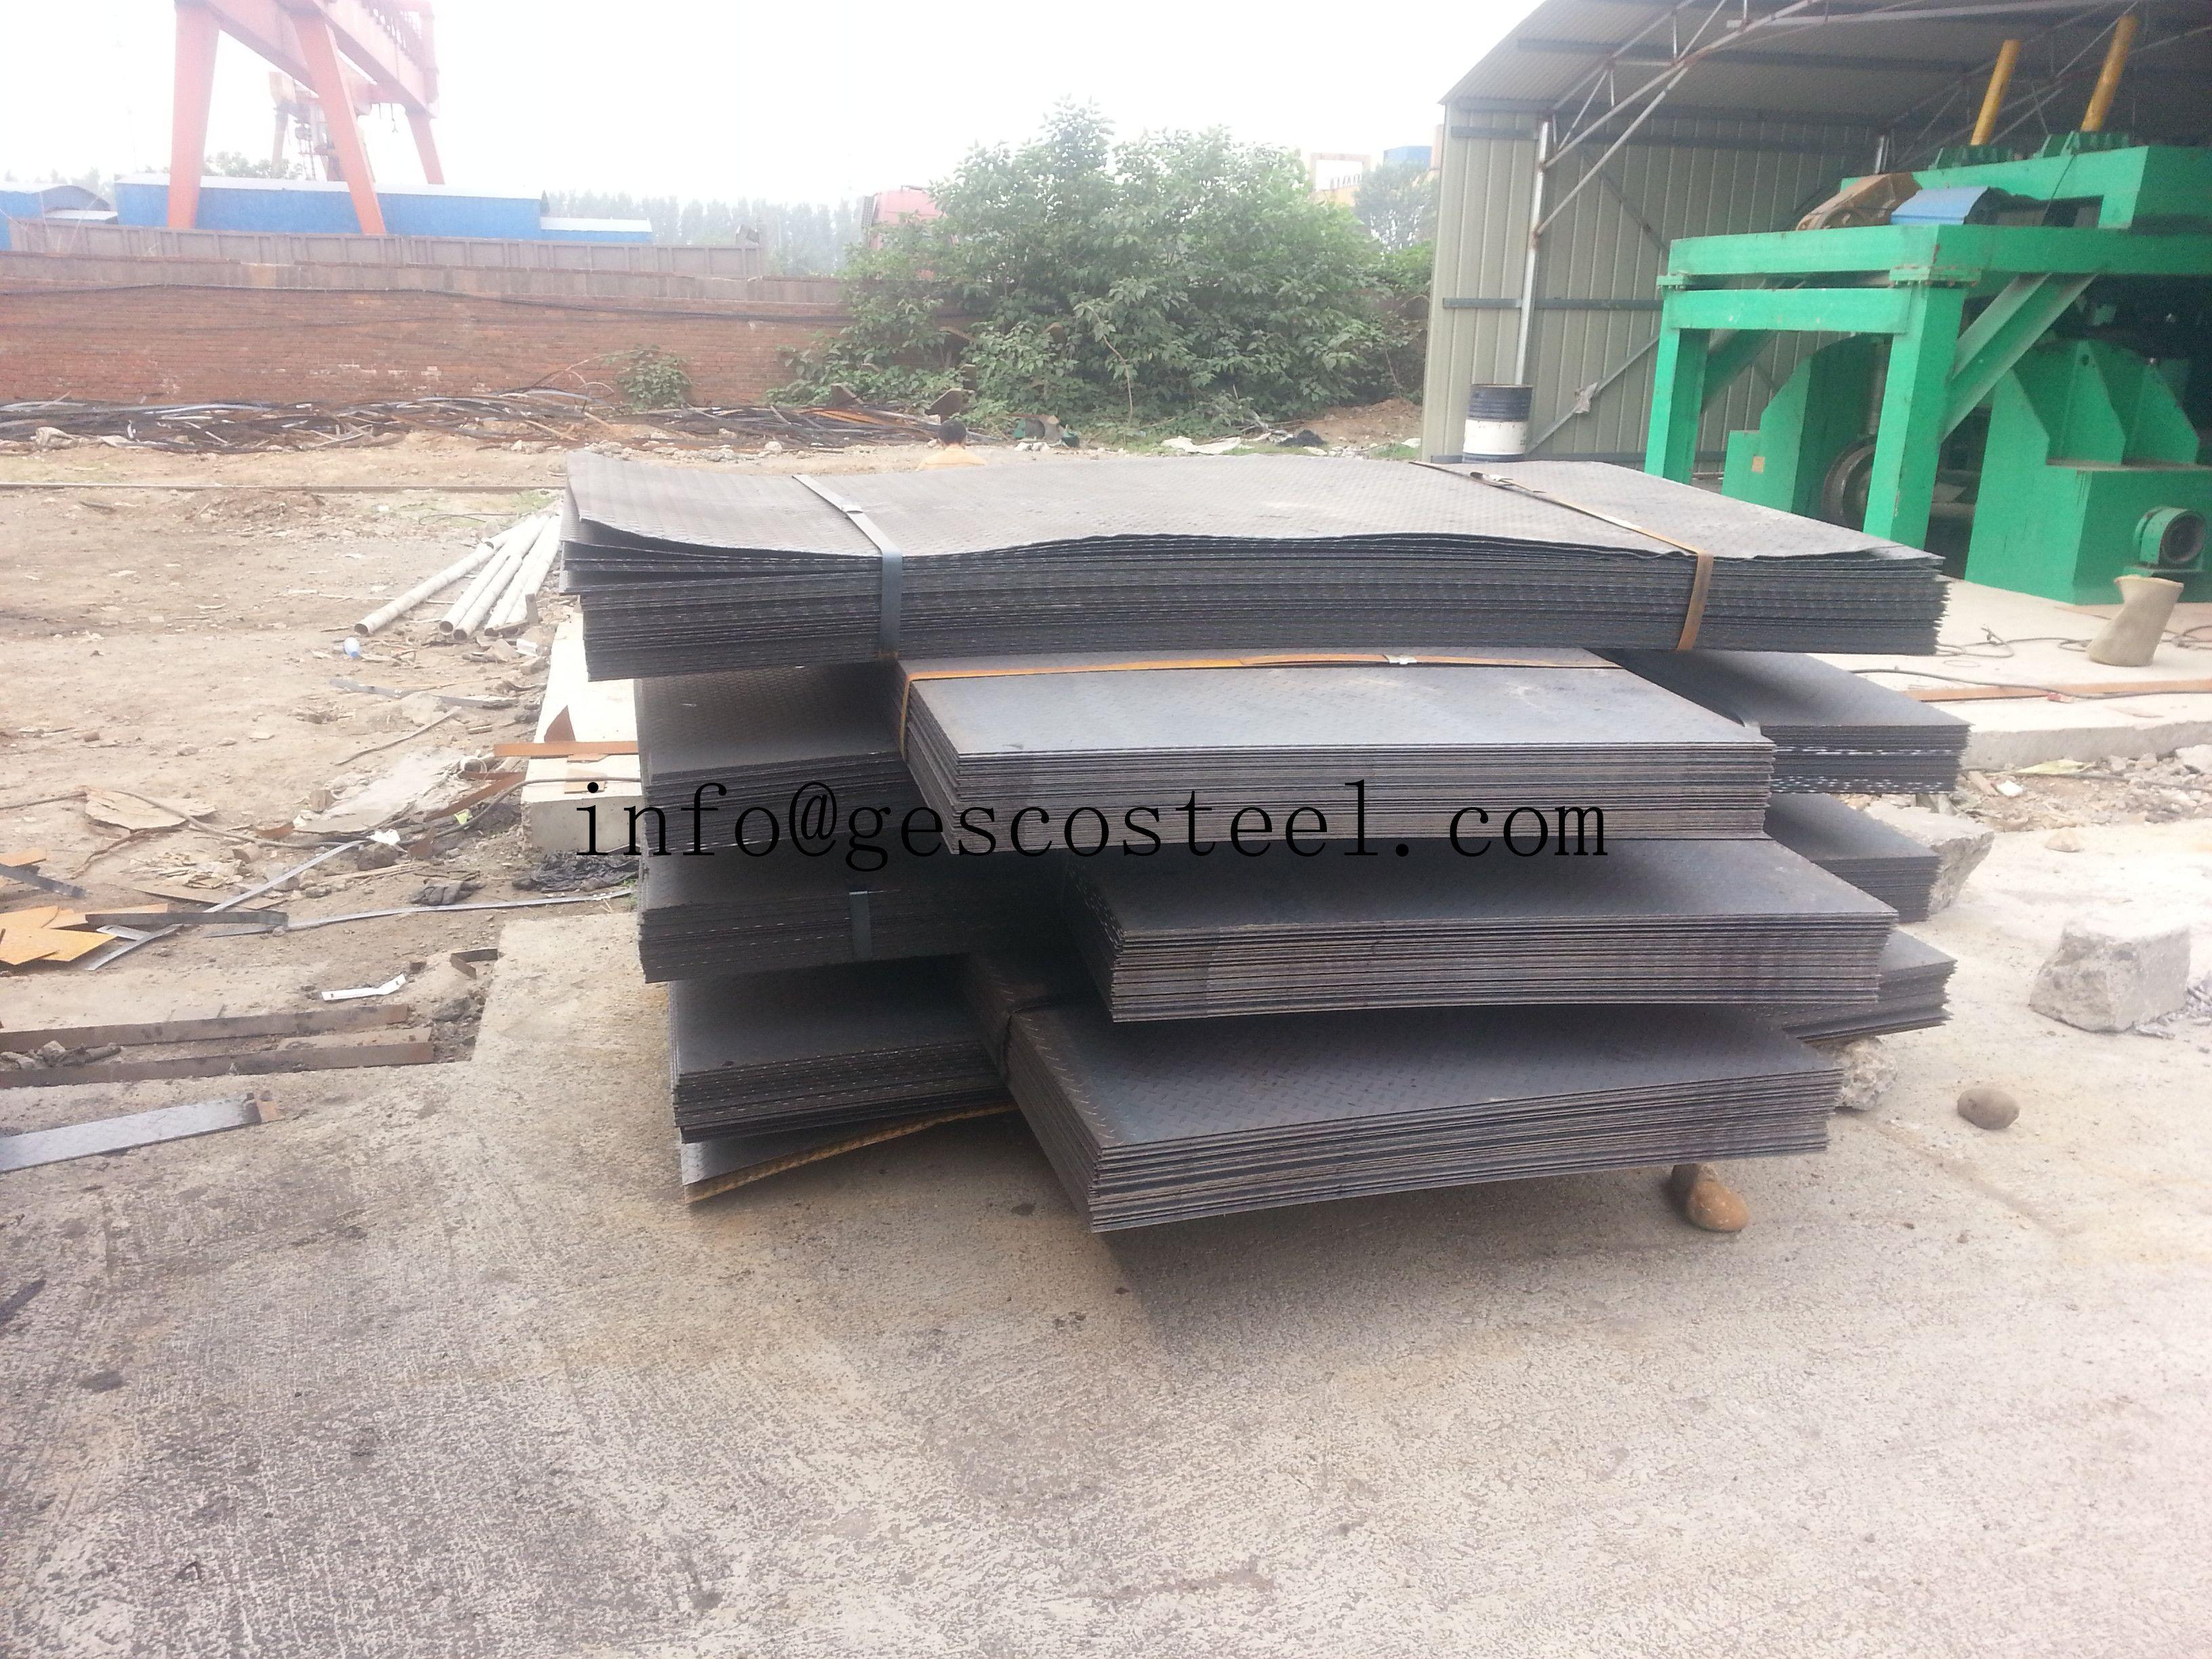 A588gr C Corten Steel Cladding Panels Steel Cladding Corten Steel Cladding Panels